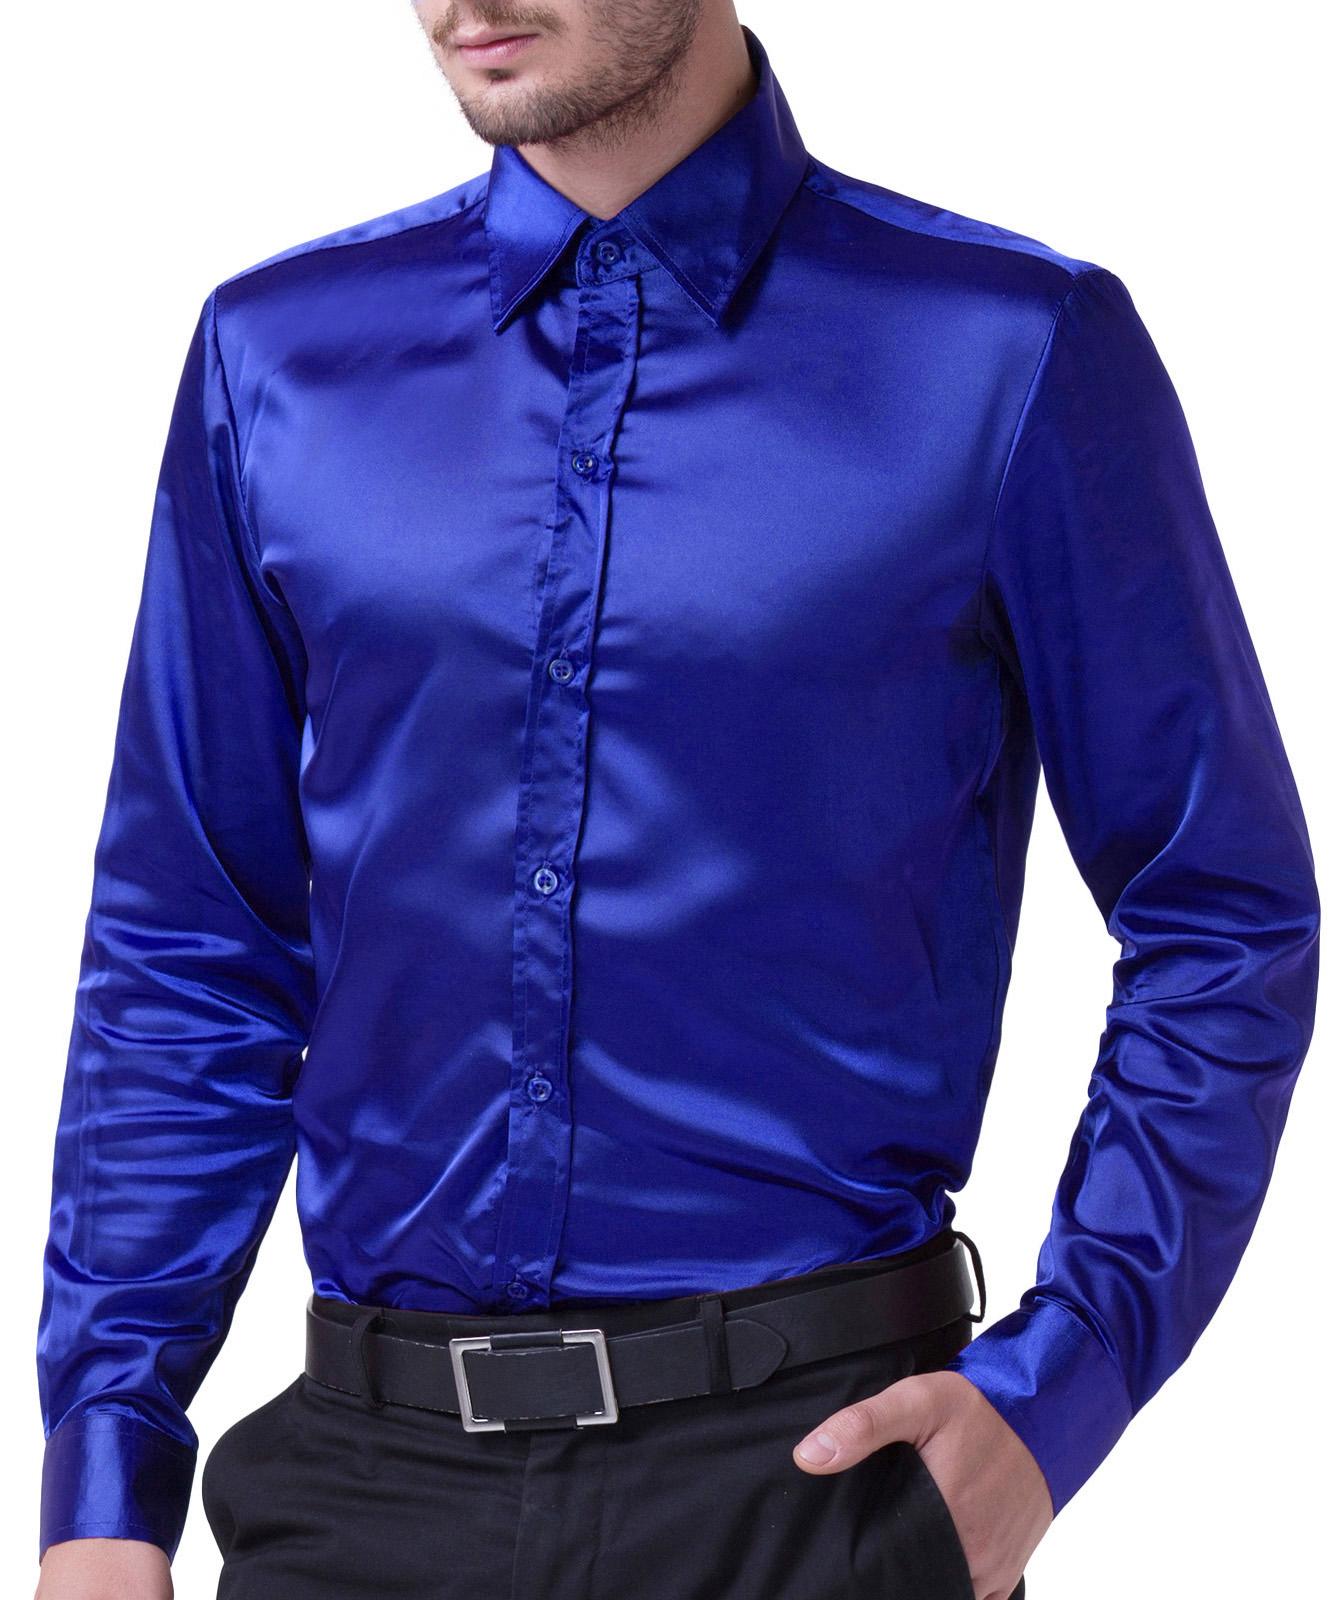 9fec3882b55 Fashion Men Shirts Luxury Silk-Like Satin Dress Shirt Tops Wedding ...